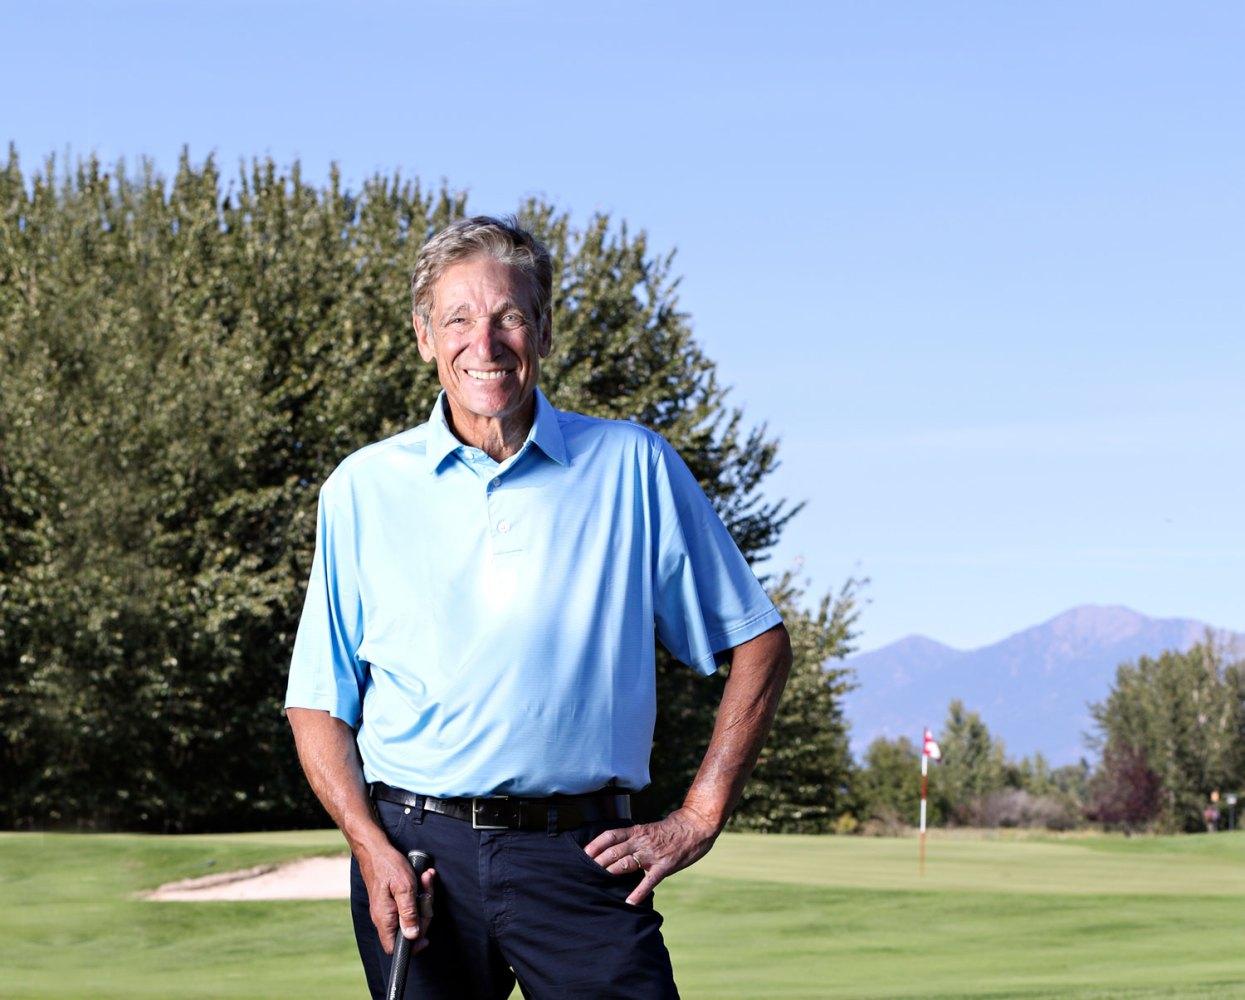 Maury Povich, 81, Remains A Golf Raconteur